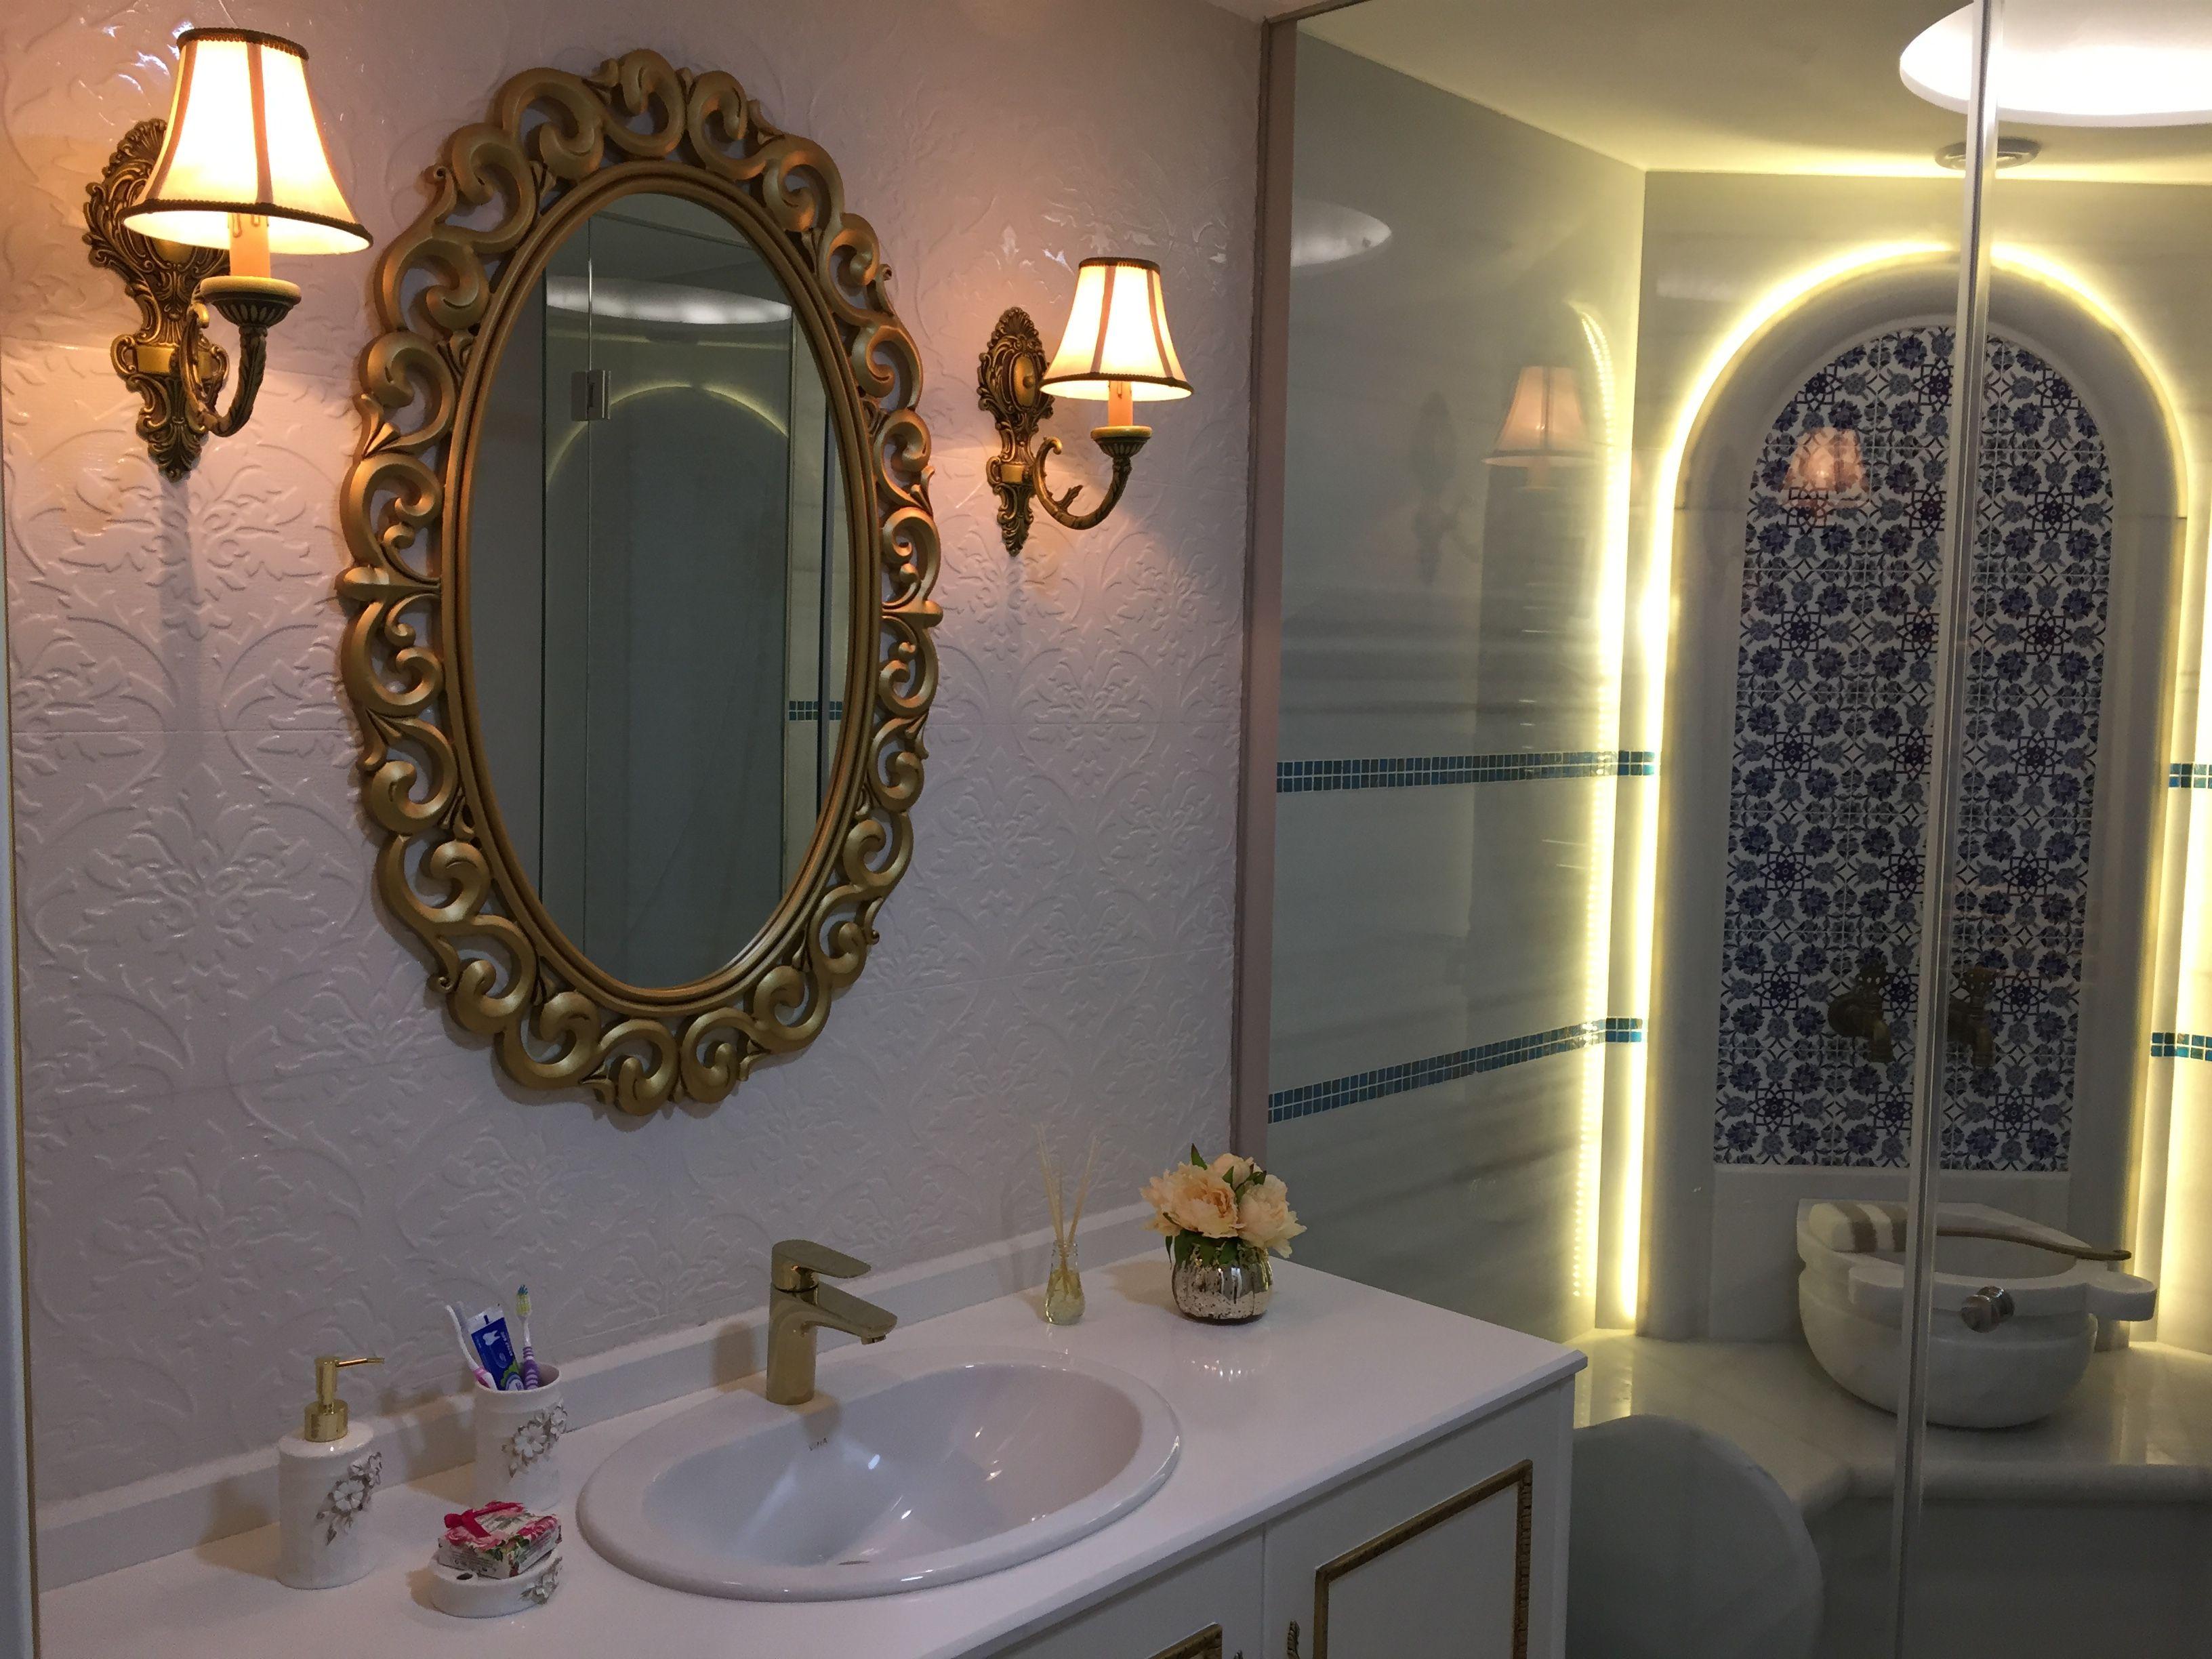 Modern mor renkli banyo dekorasyonu ev dekorasyonu dizayn -  Klasik Banyo Banyo Dekorasyonu Banyo Tasar M K Zel Tasar M Banyo Tezgah Banyo Dolab Ferah Beyaz Banyo Du Akabin Du Banyo Deck Ah Ap Du